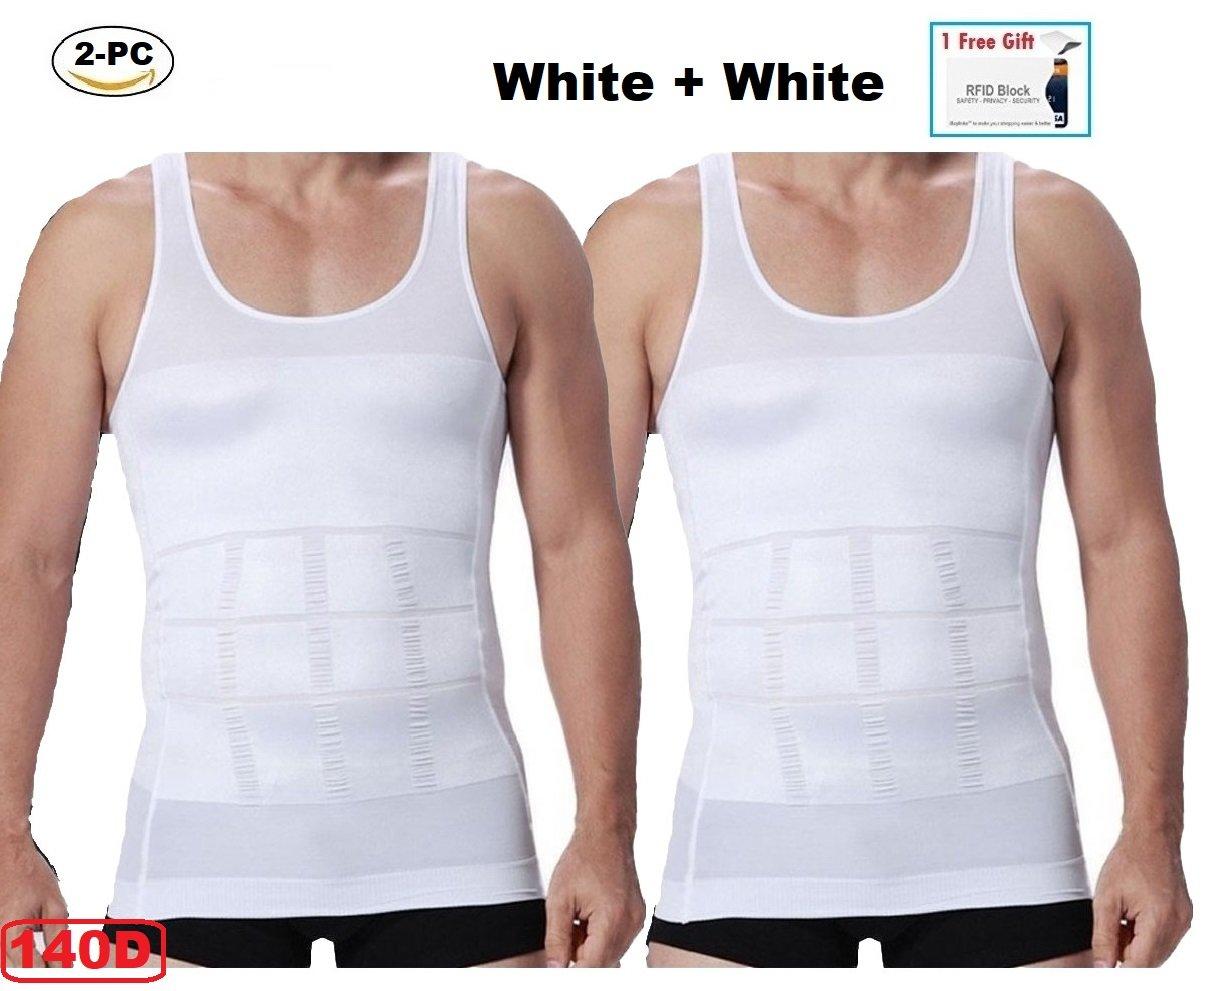 2pc Mens Slim Body Shaper Compression Undershirt (2 white or 2 black) +1 RREE GIFT CNDW